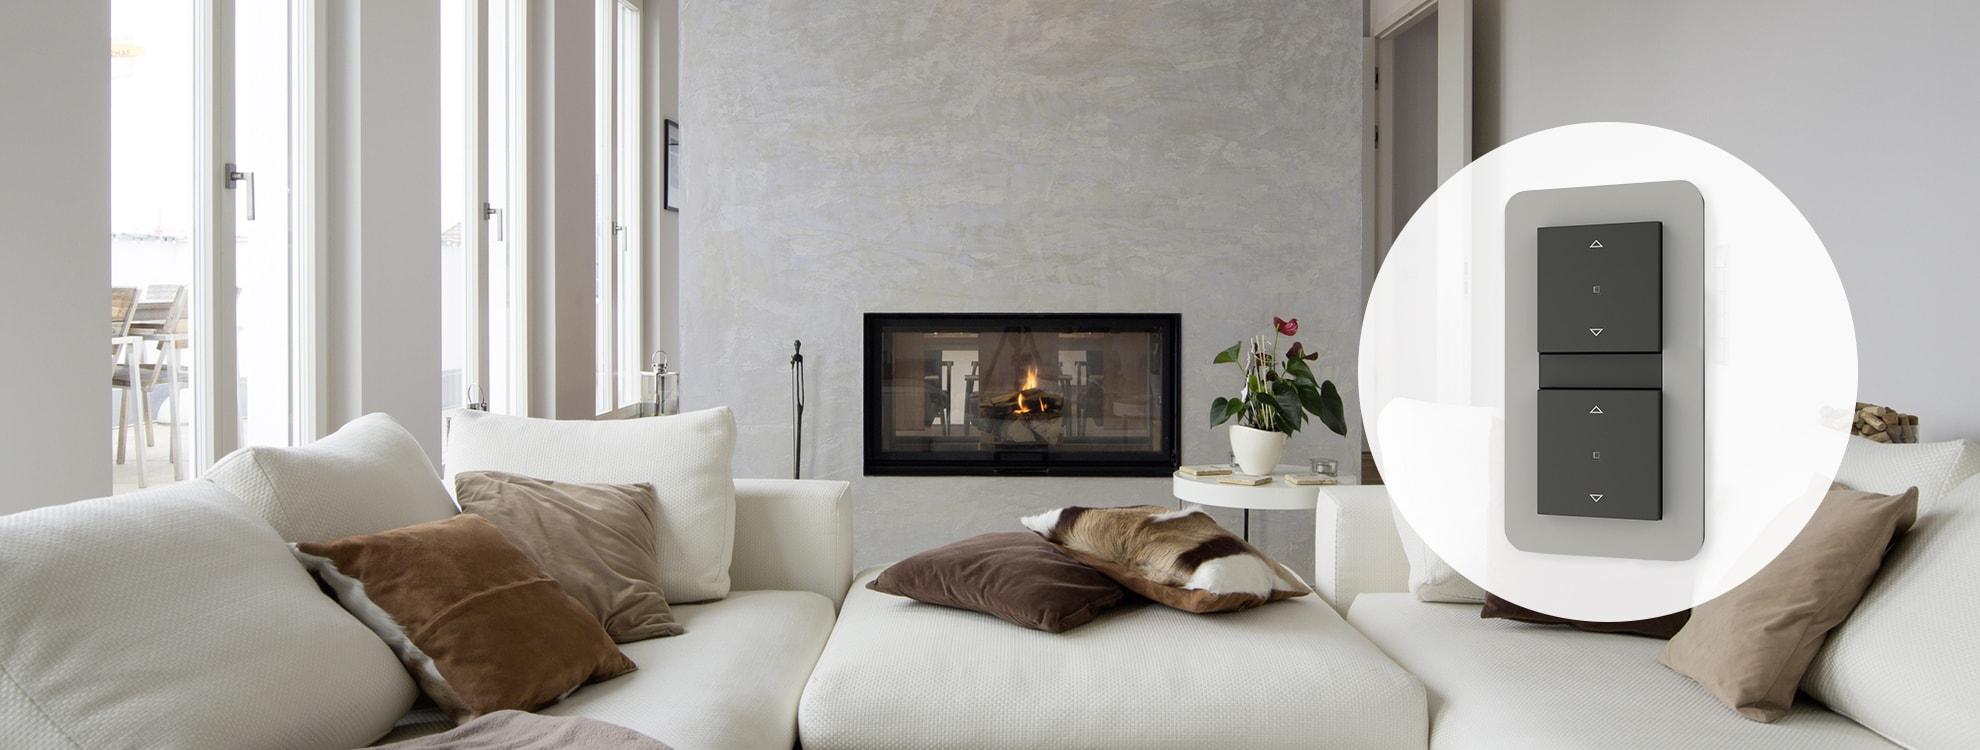 eNet Smart Home: Design